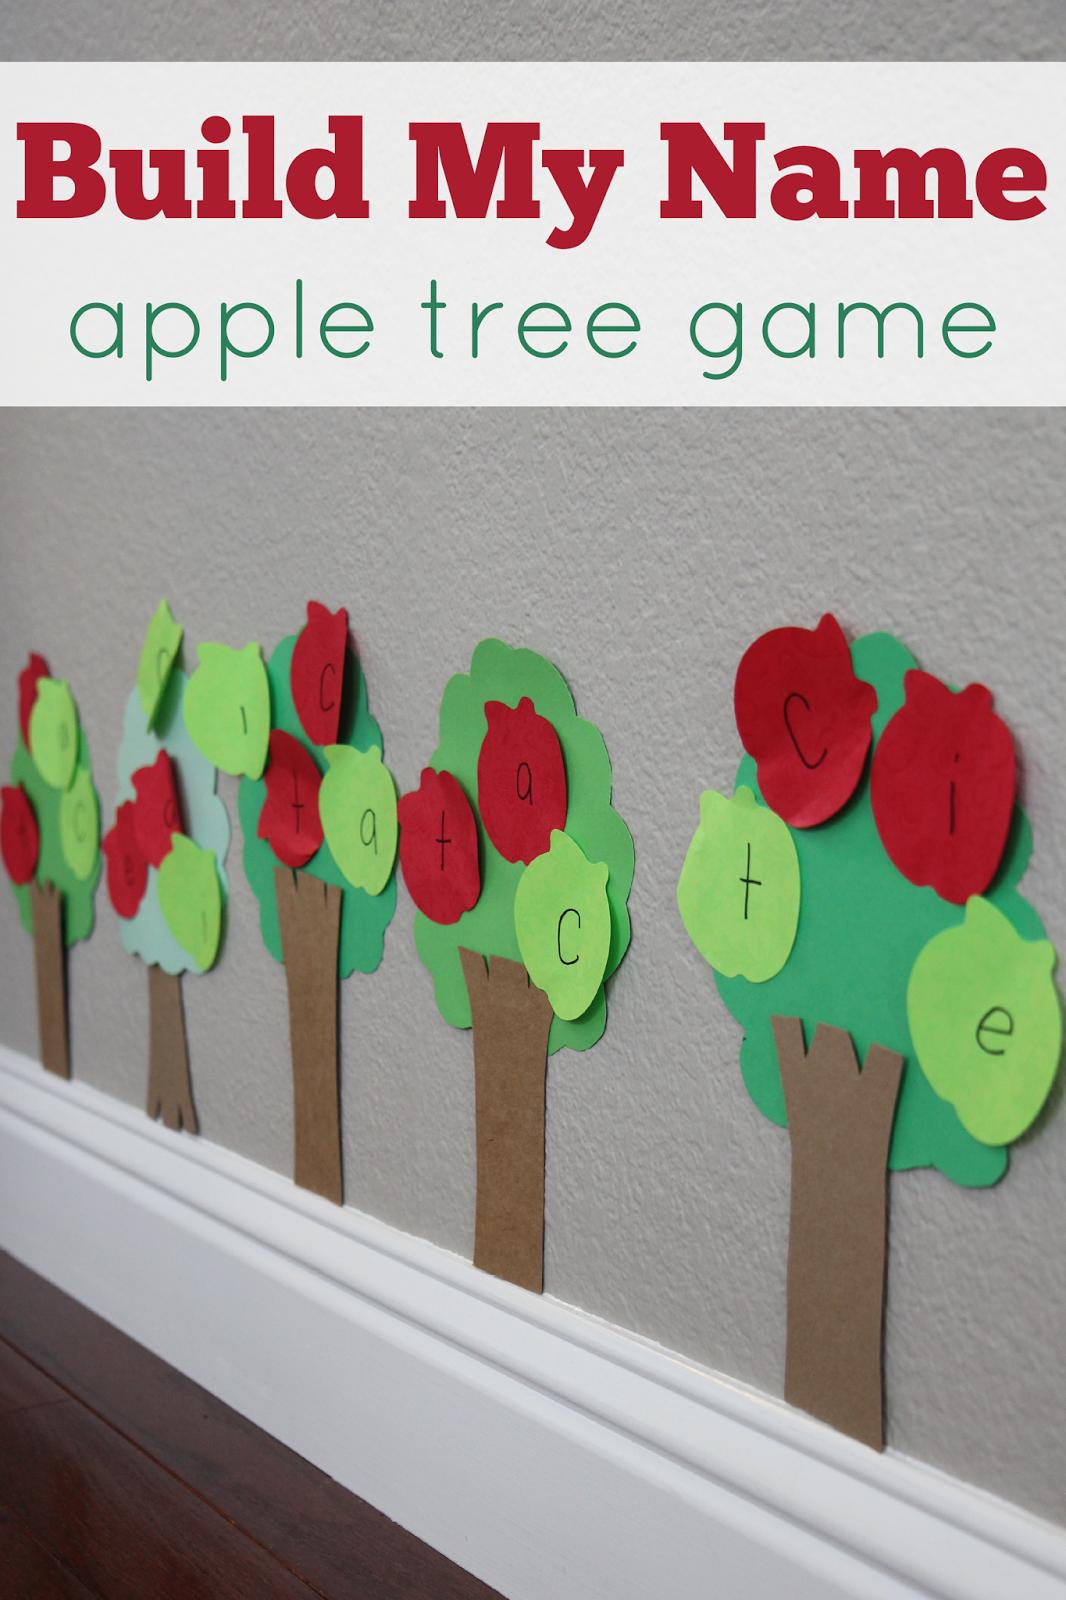 Build My Name Apple Tree Game